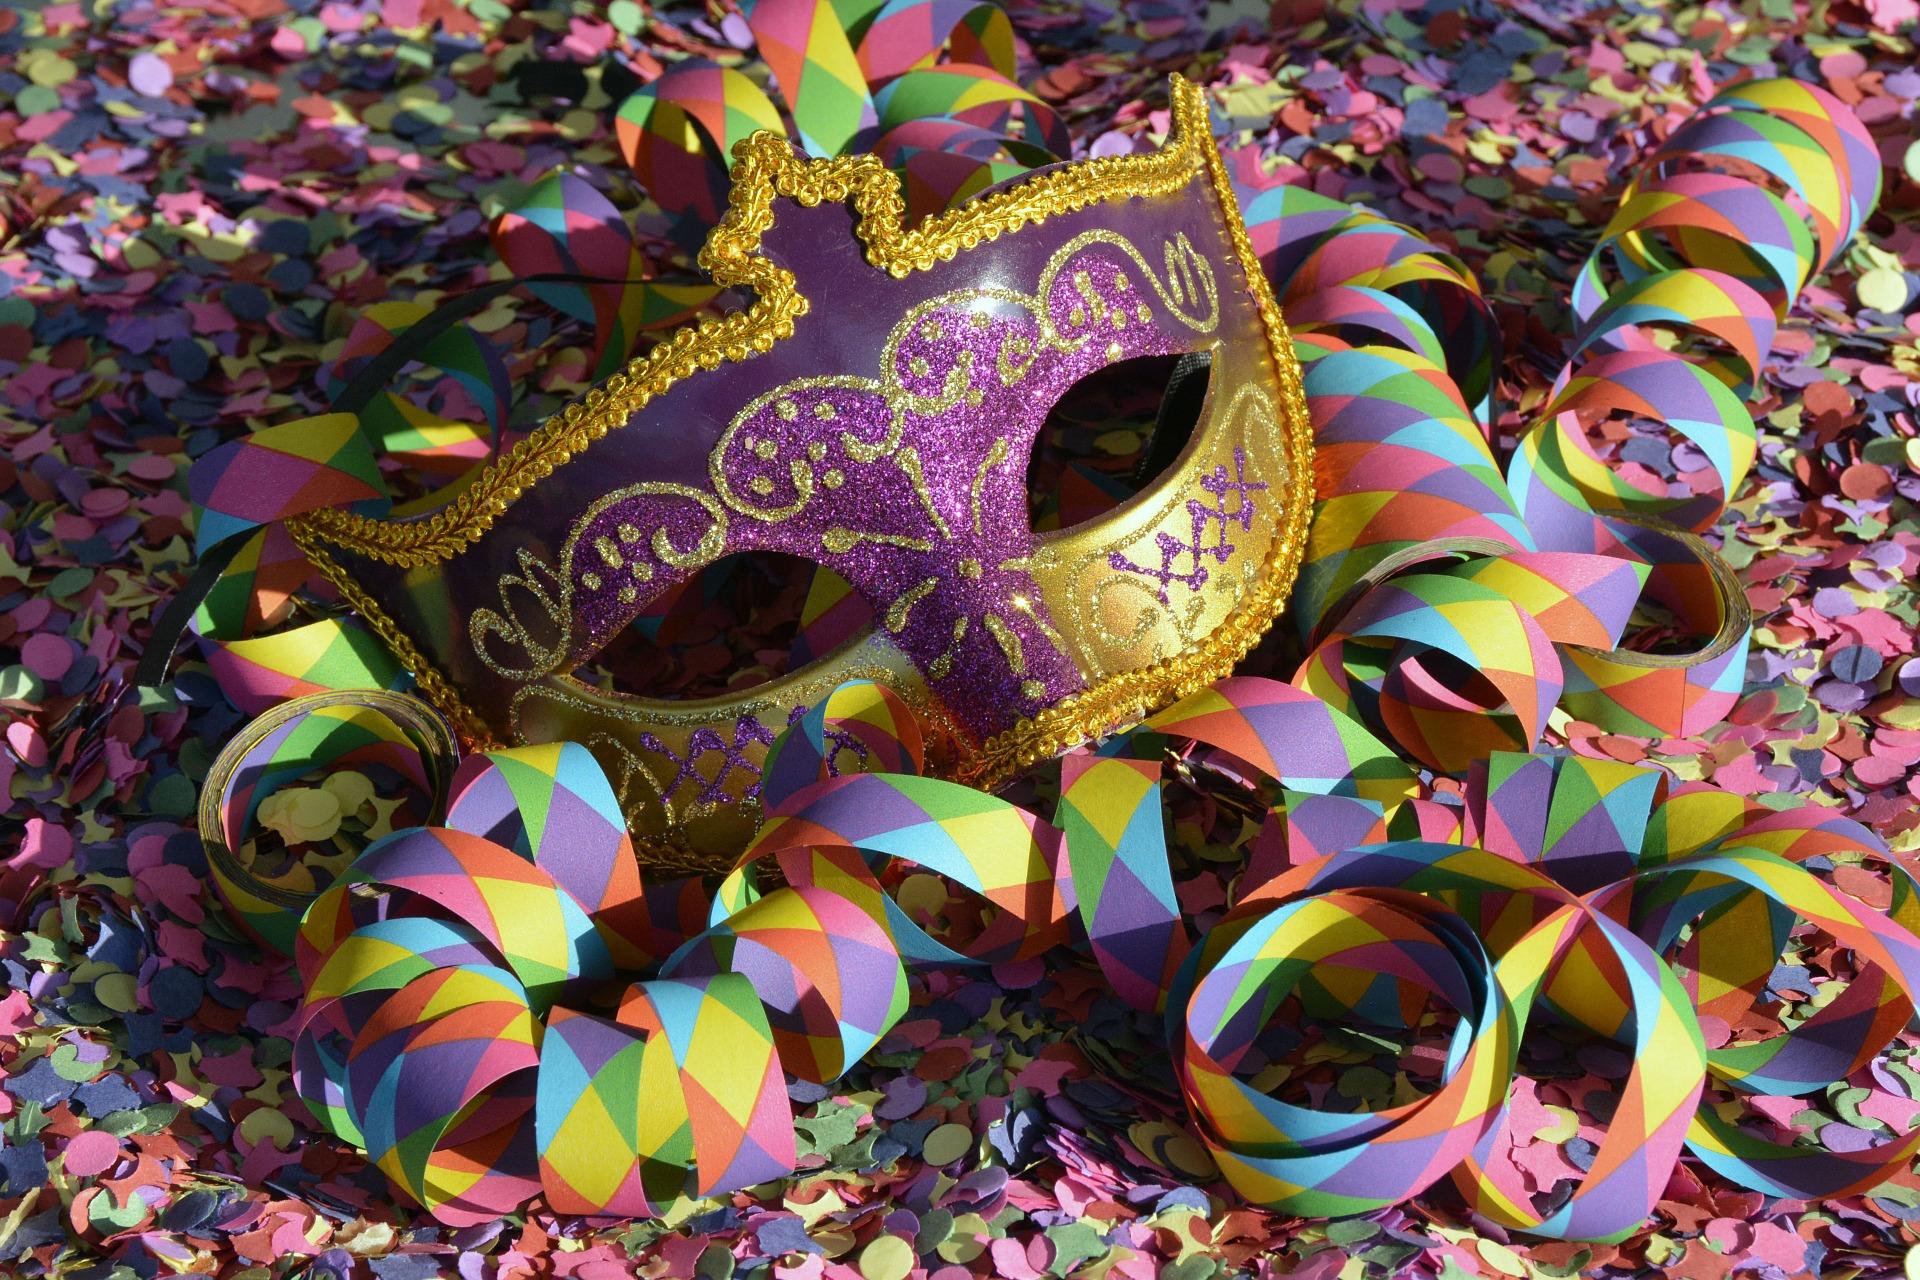 Carnevale: Rabadan in sicurezza con De Gusta